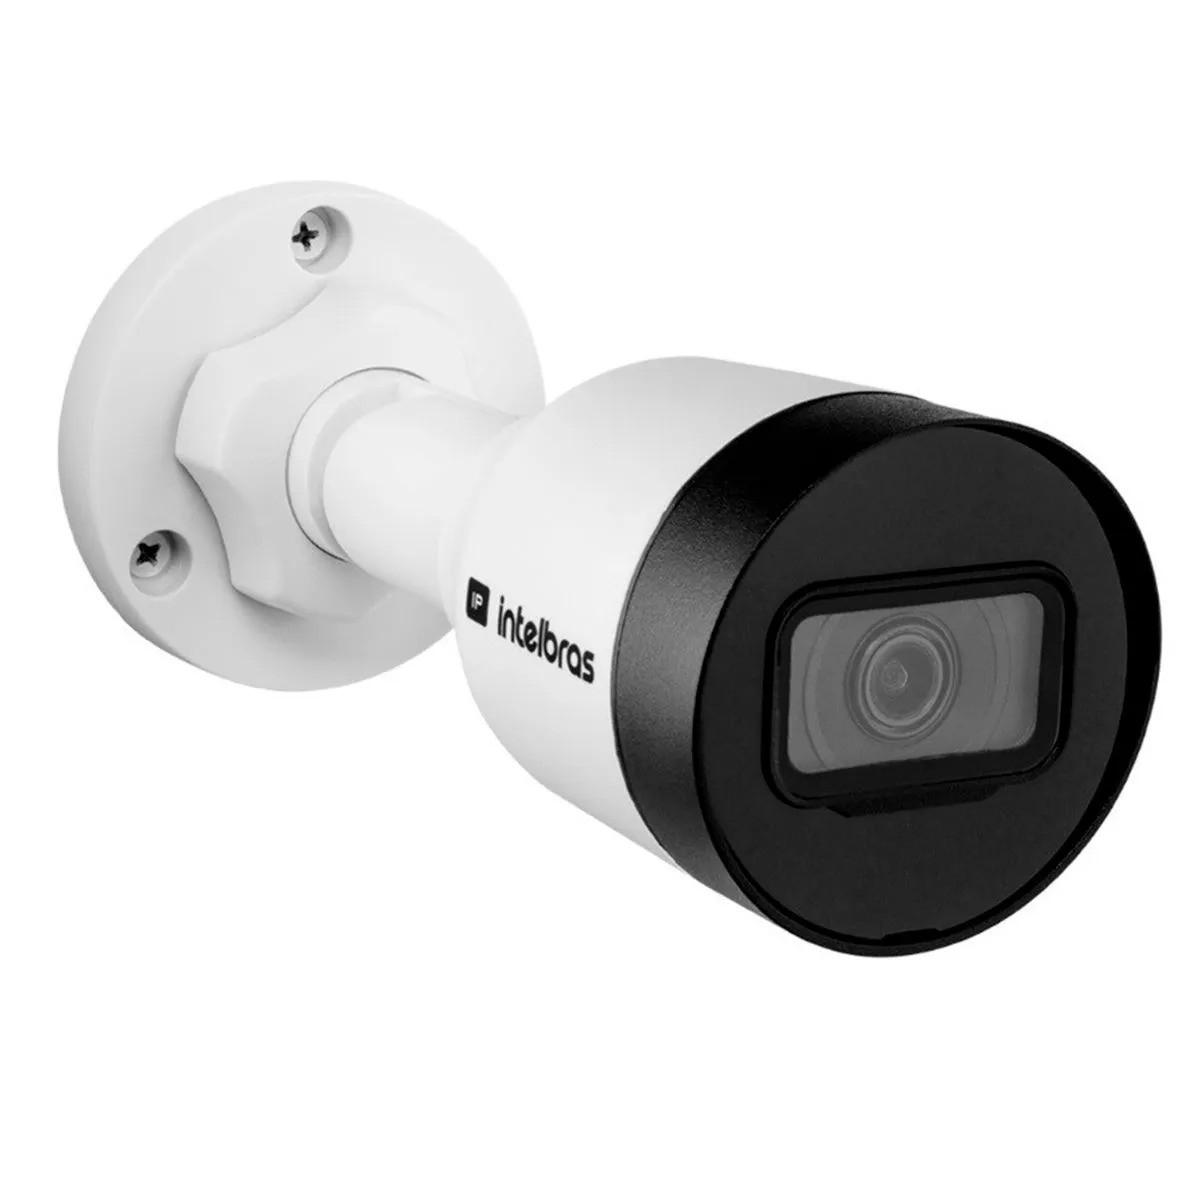 Câmera Intelbras Bullet VIP 1020 B IP Onvif PoE G2(1.0MP | 720p | 3.6mm | Plast)  - CFTV Clube | Brasil